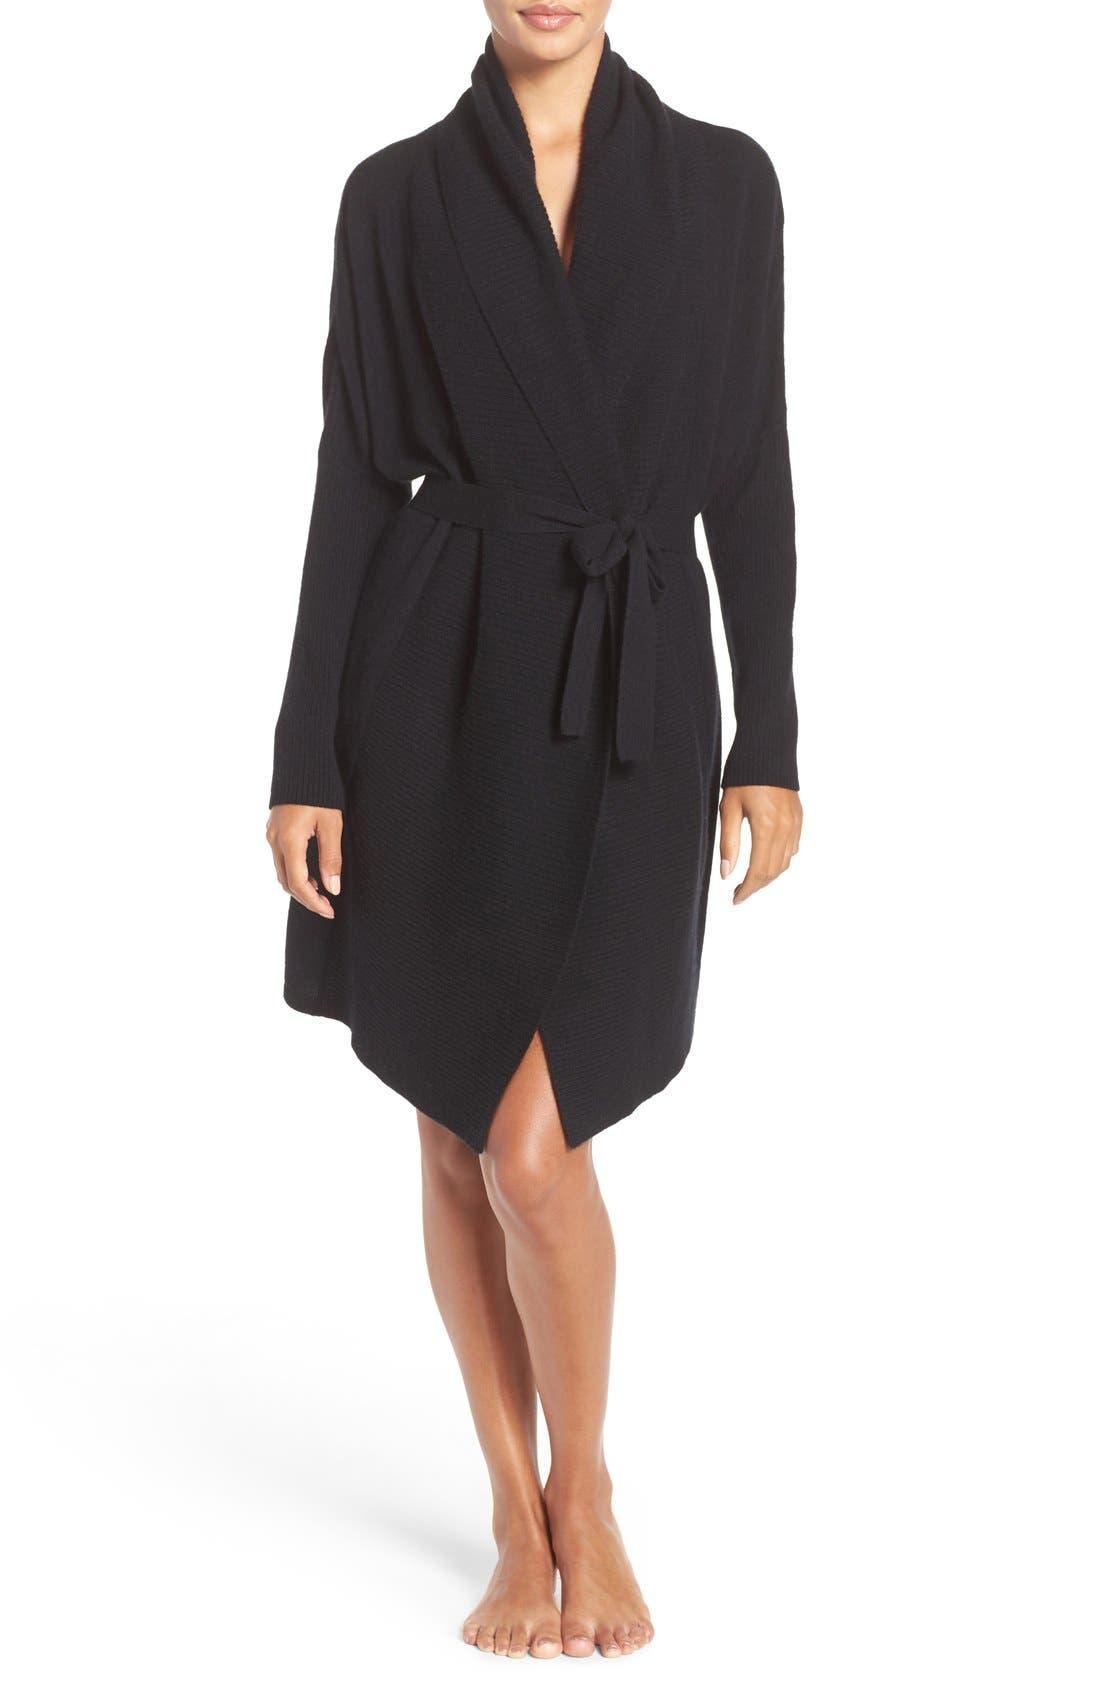 UGG 'Cheyenne' Cashmere Robe